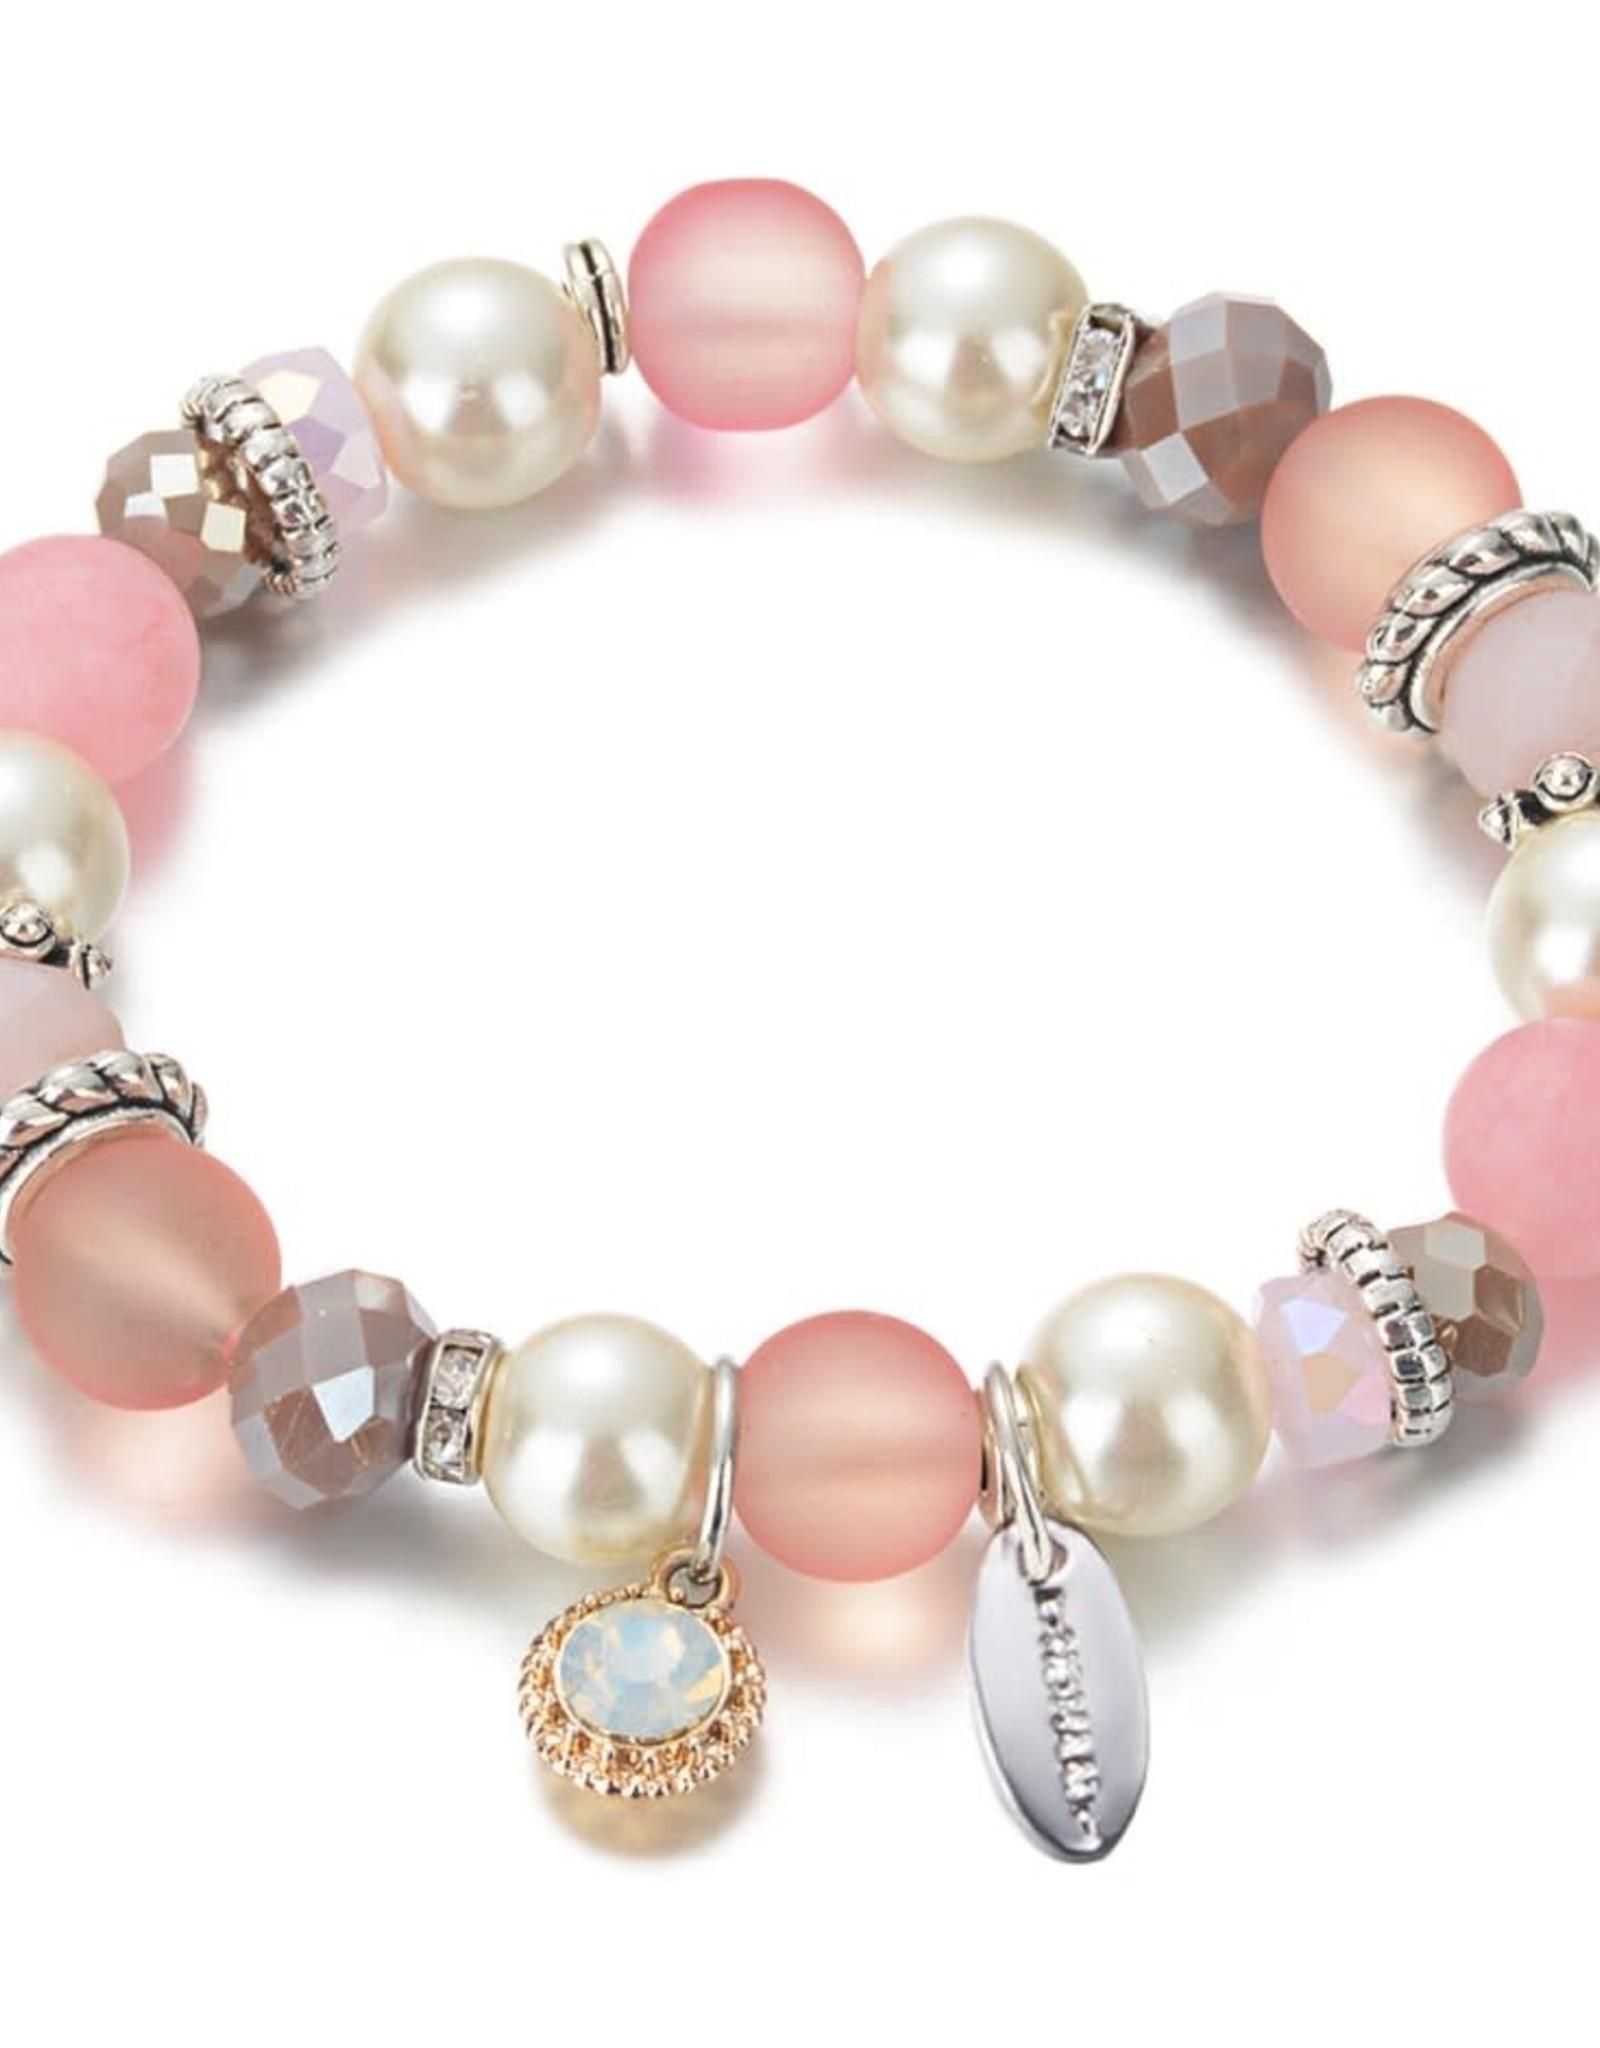 NOMAAD Bracelet - Passion